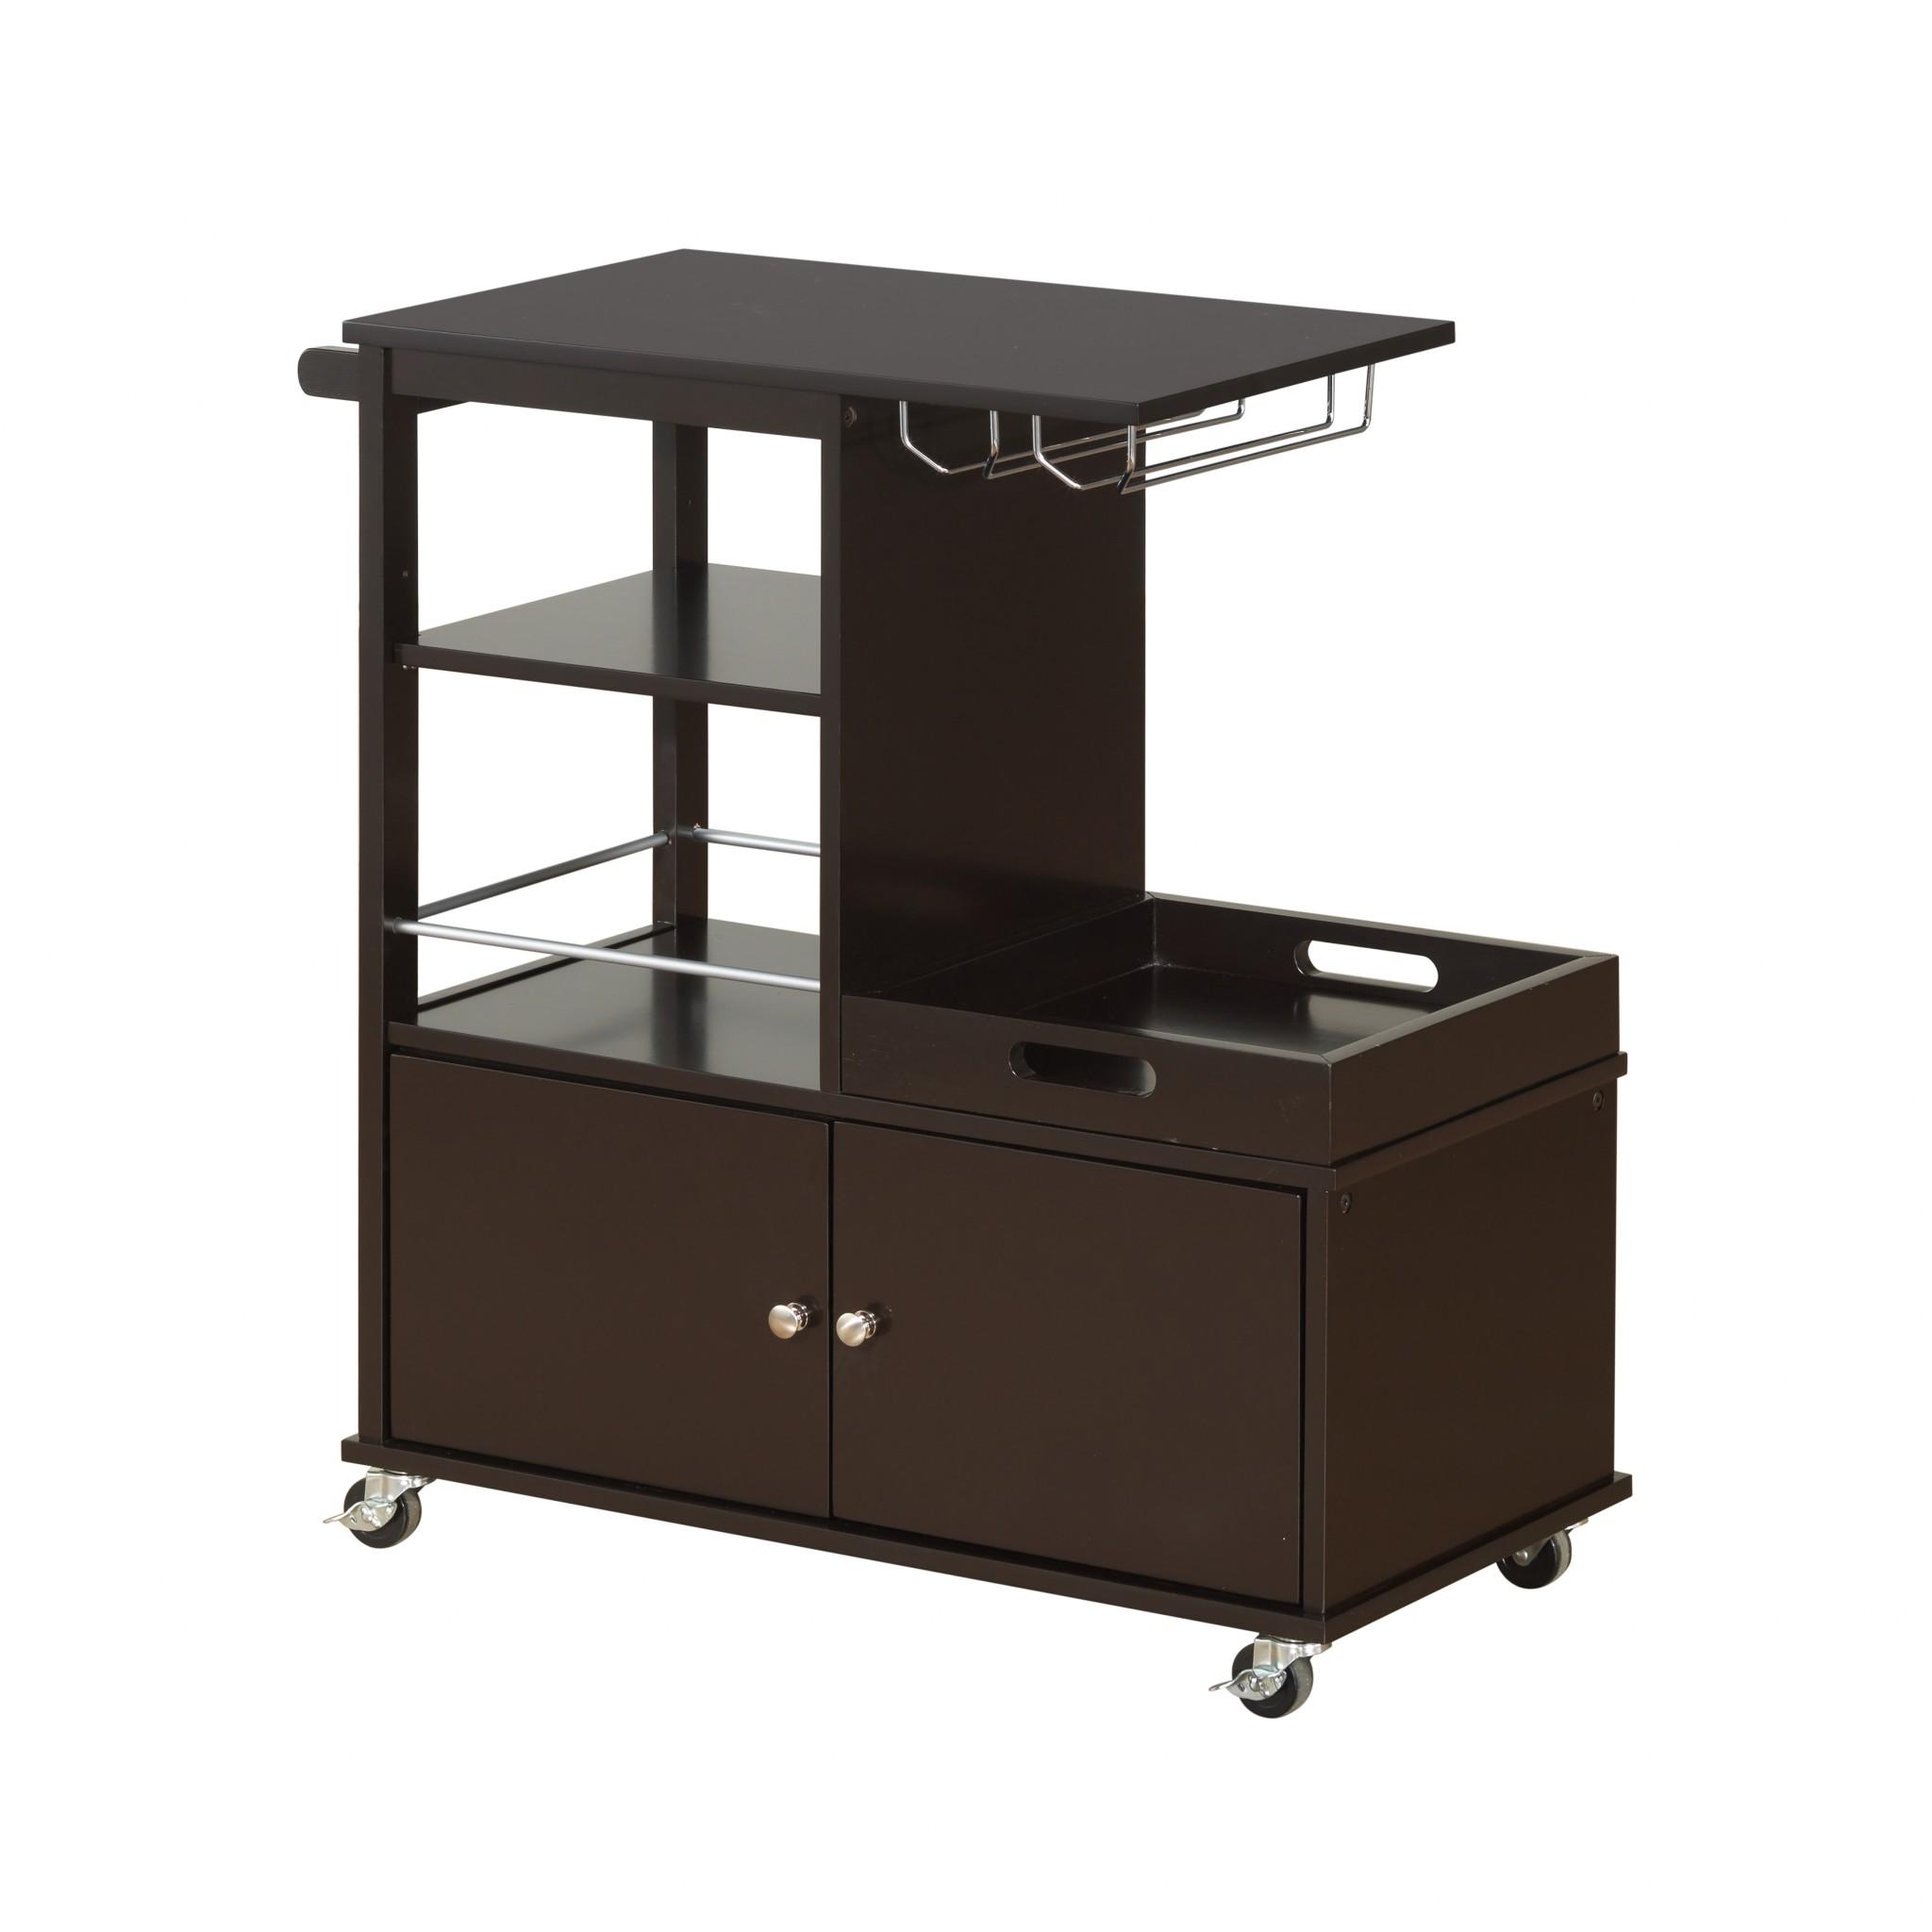 "16"" X 34"" X 34"" Wenge Wood Casters Kitchen Cart"